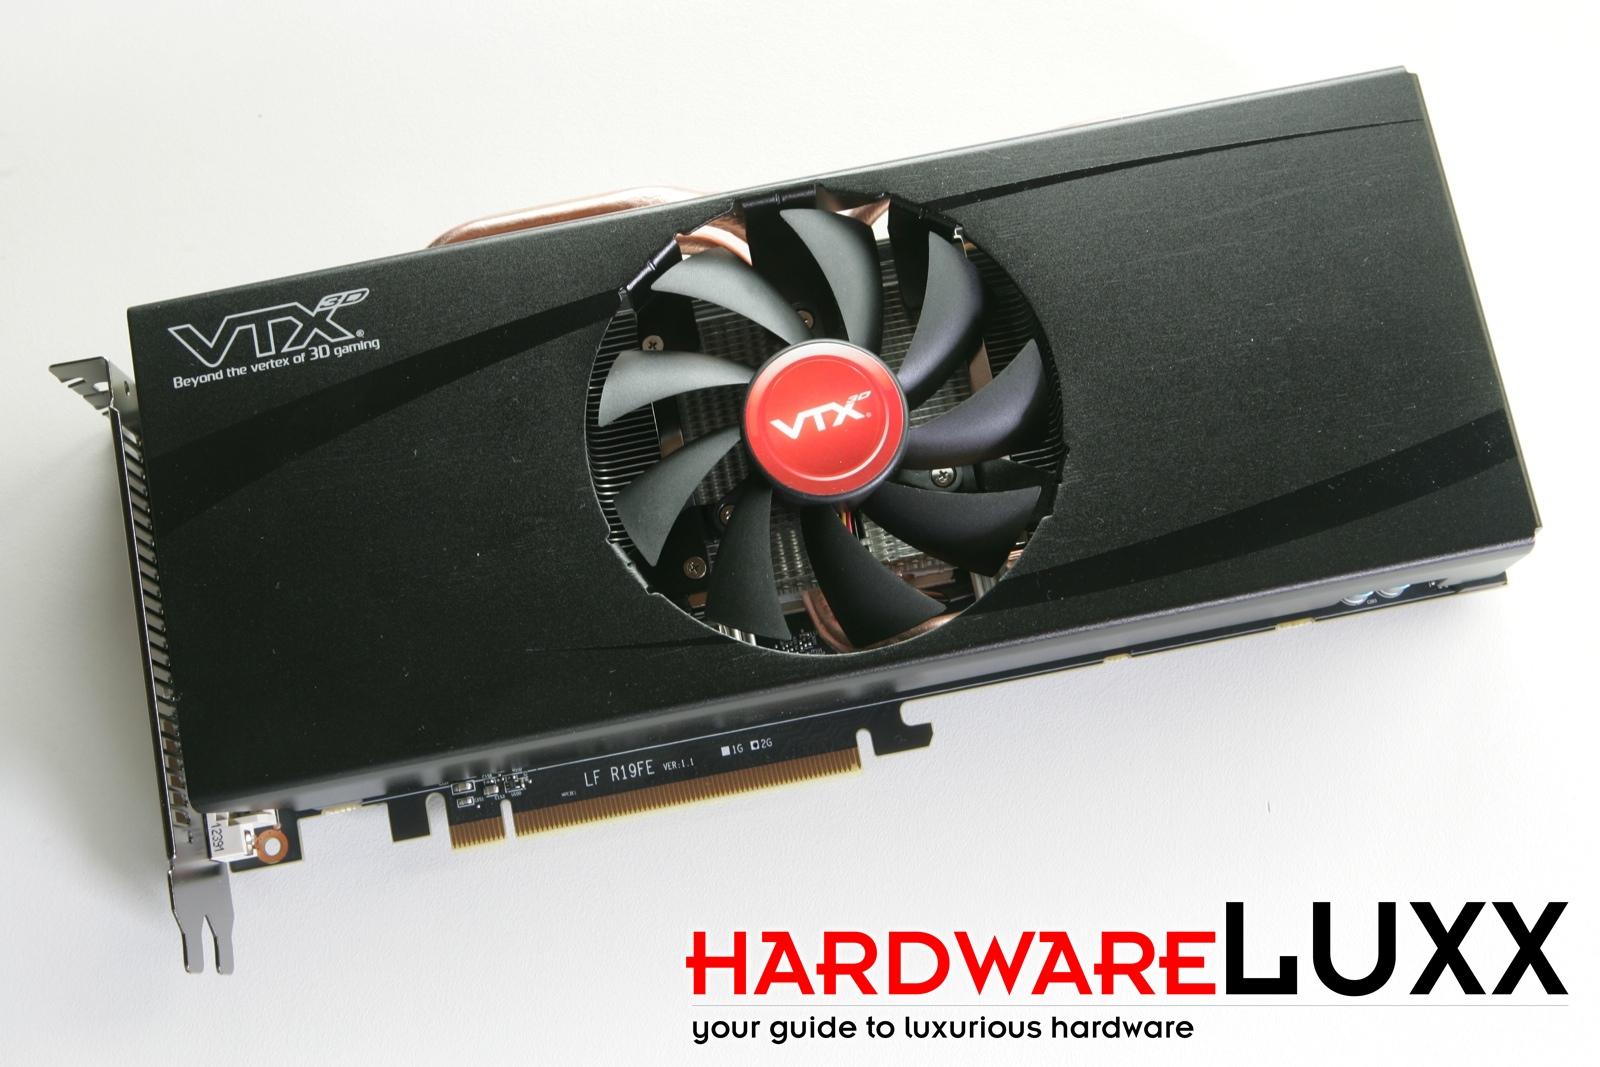 Тест и обзор: две видеокарты Radeon HD 7870 (Tahiti LE) от ...: http://www.hardwareluxx.ru/index.php/artikel/hardware/grafikkarten/24372.html